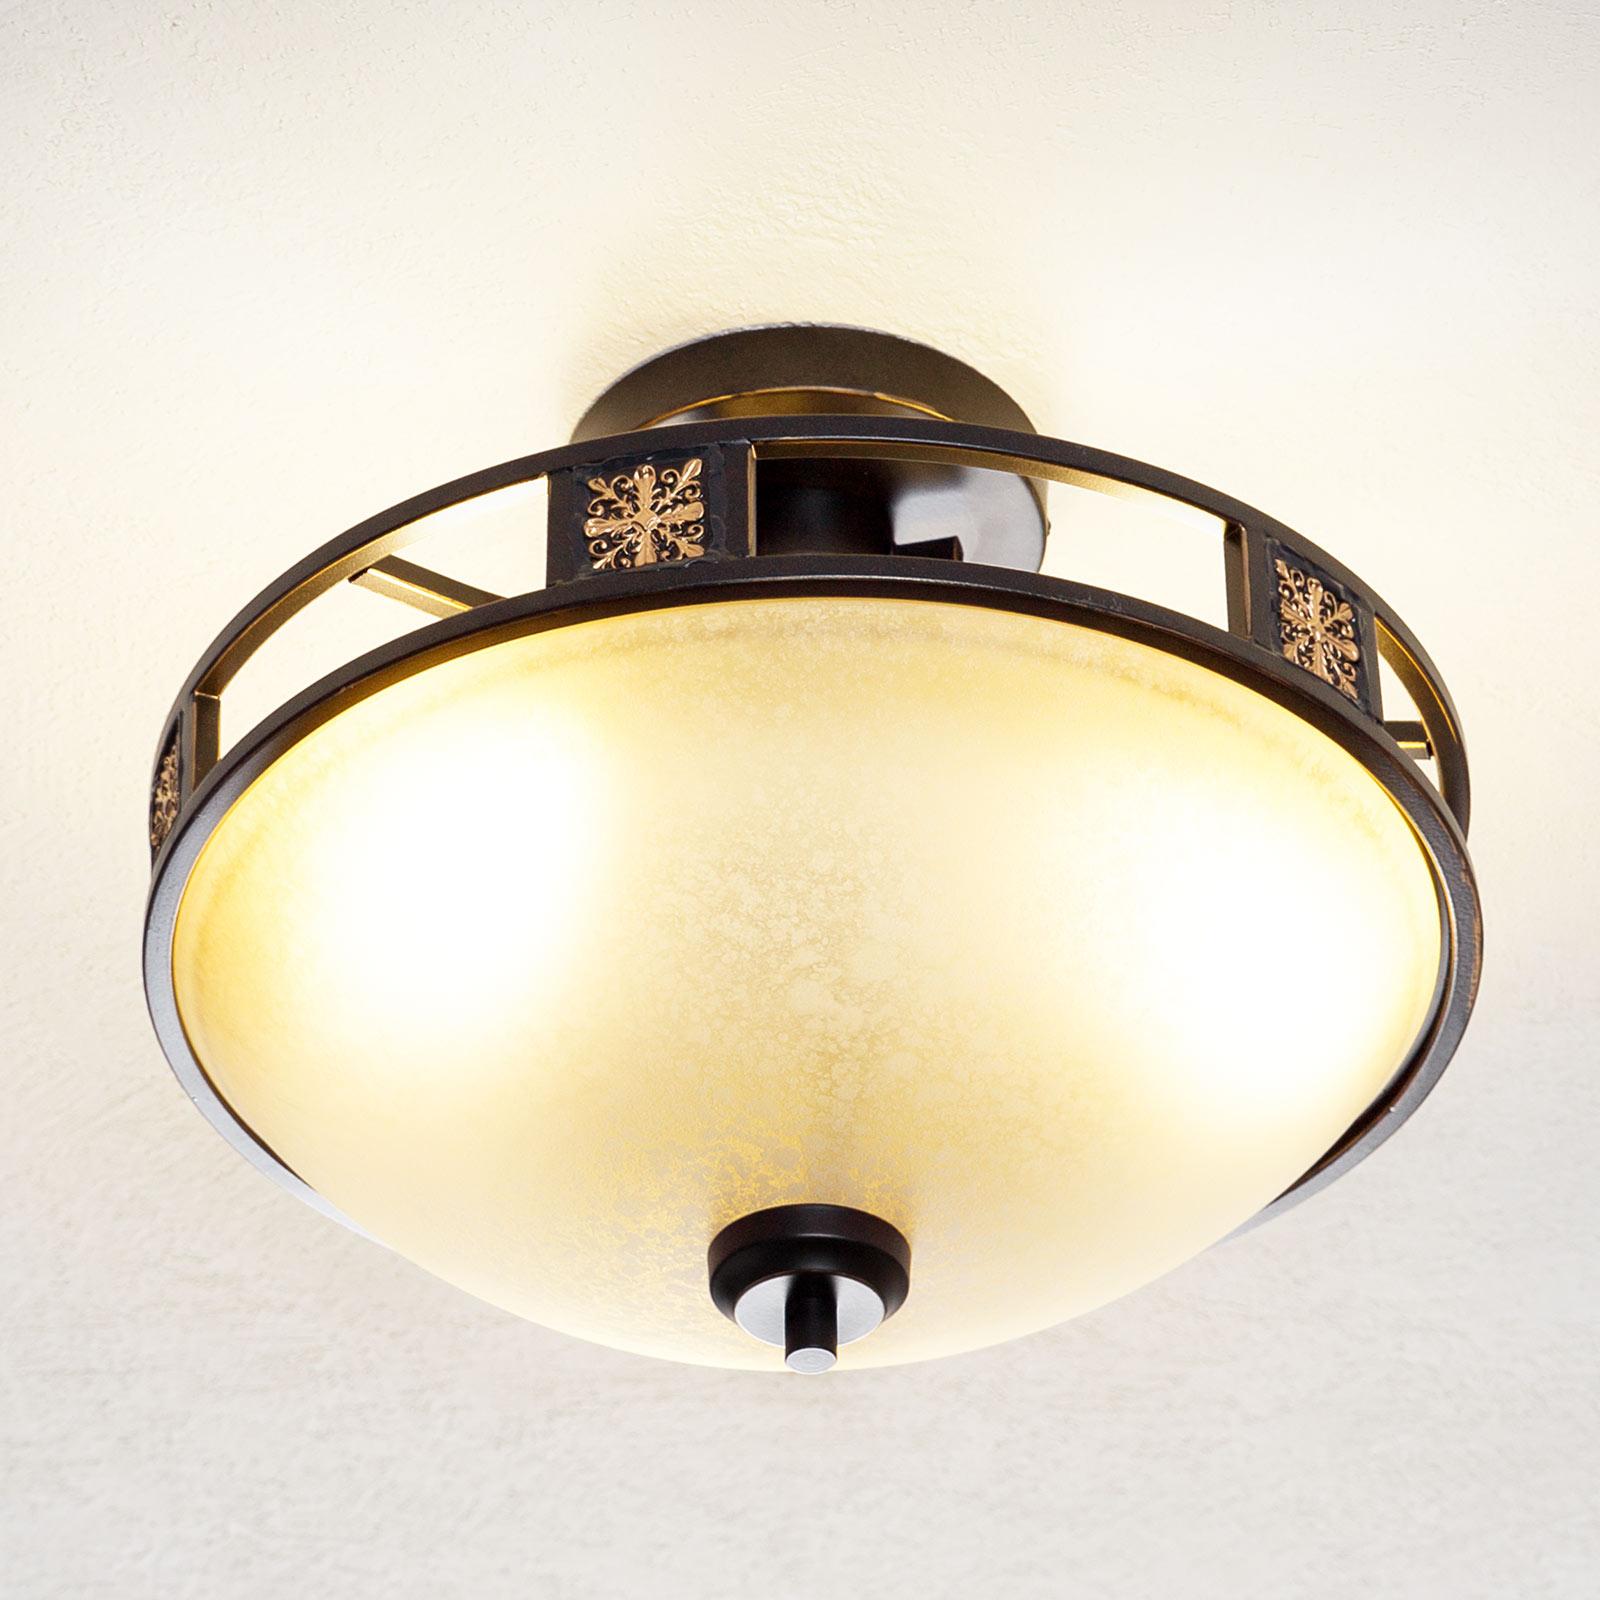 Antyczna lampa sufitowa Caecilia 42 cm